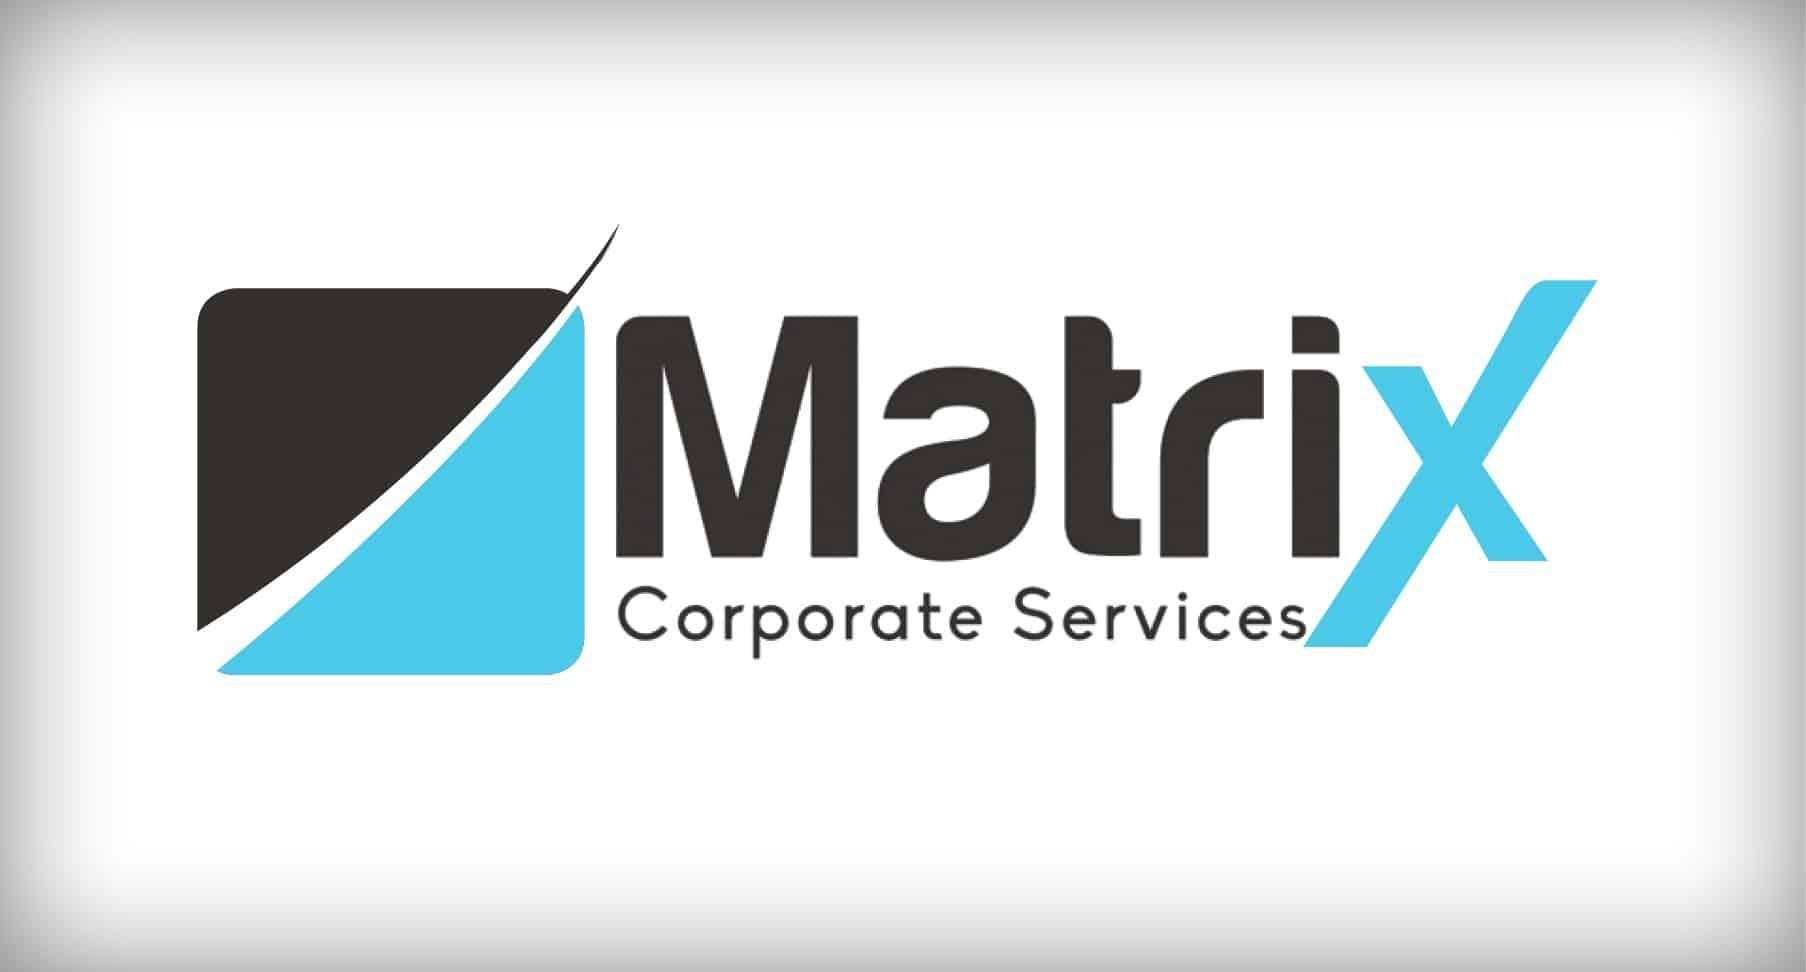 corporate logo design professional matrix corporate services